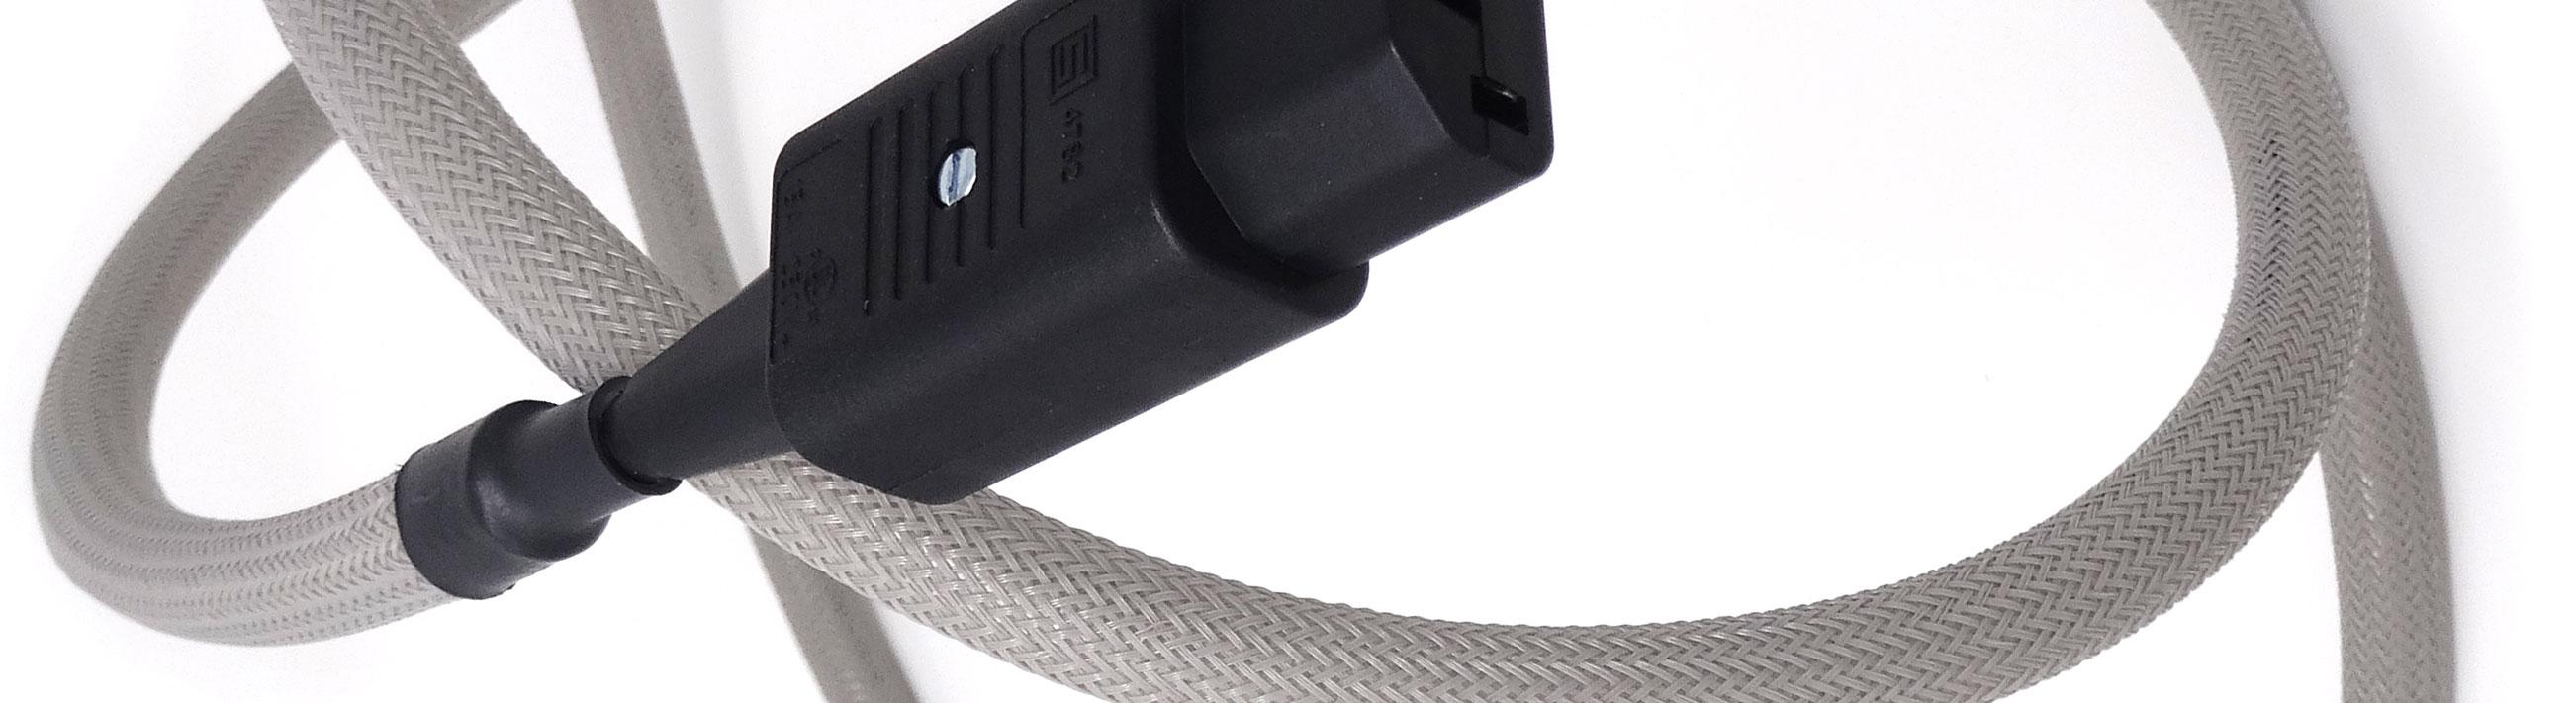 New product: Shawline Power Chord